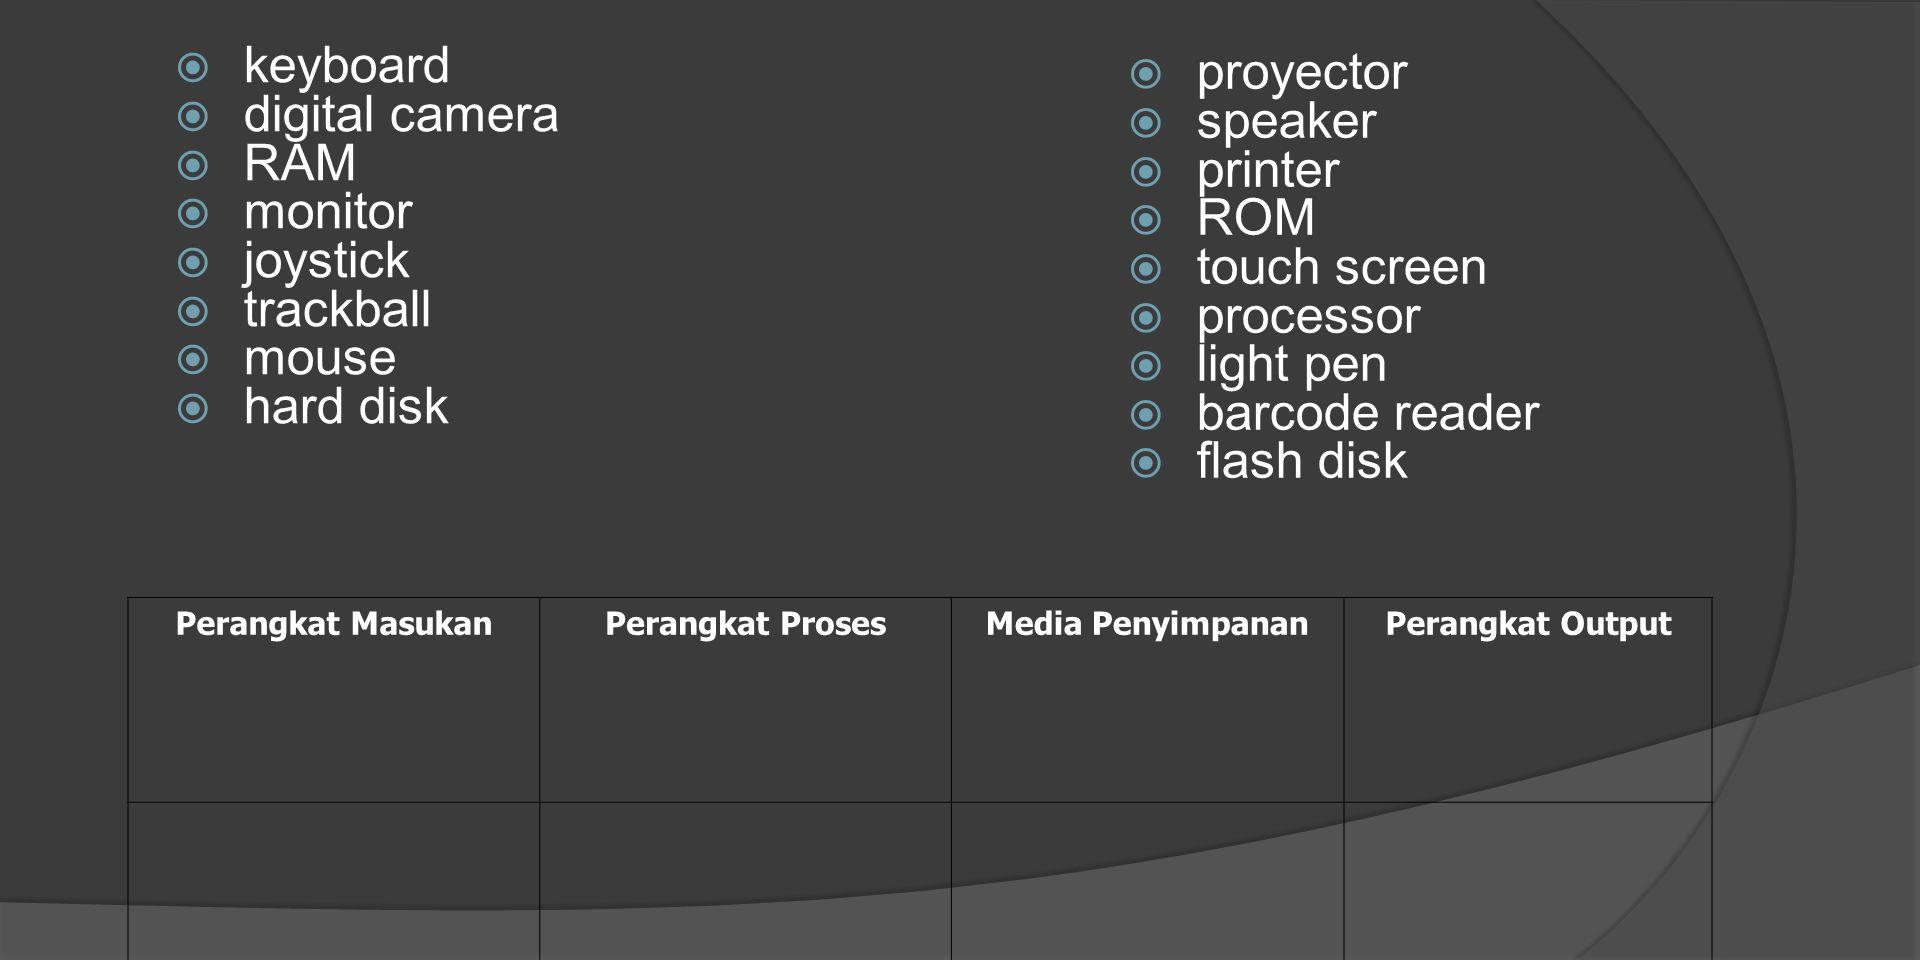 keyboard proyector digital camera speaker RAM printer monitor ROM